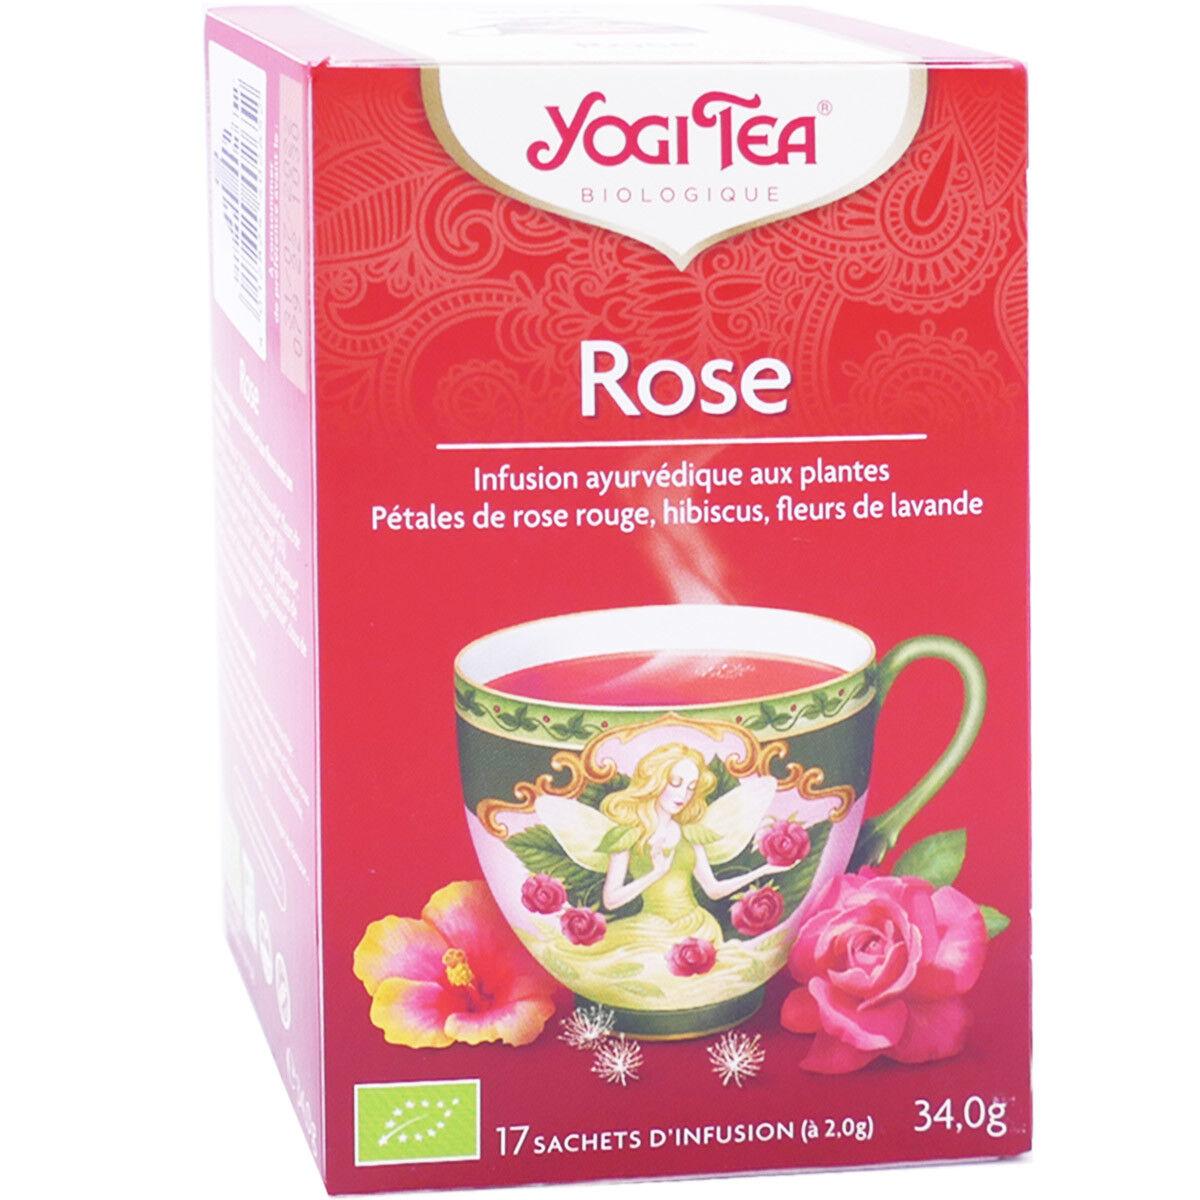 Yogi tea rose 17 sachets d'infusion 34g